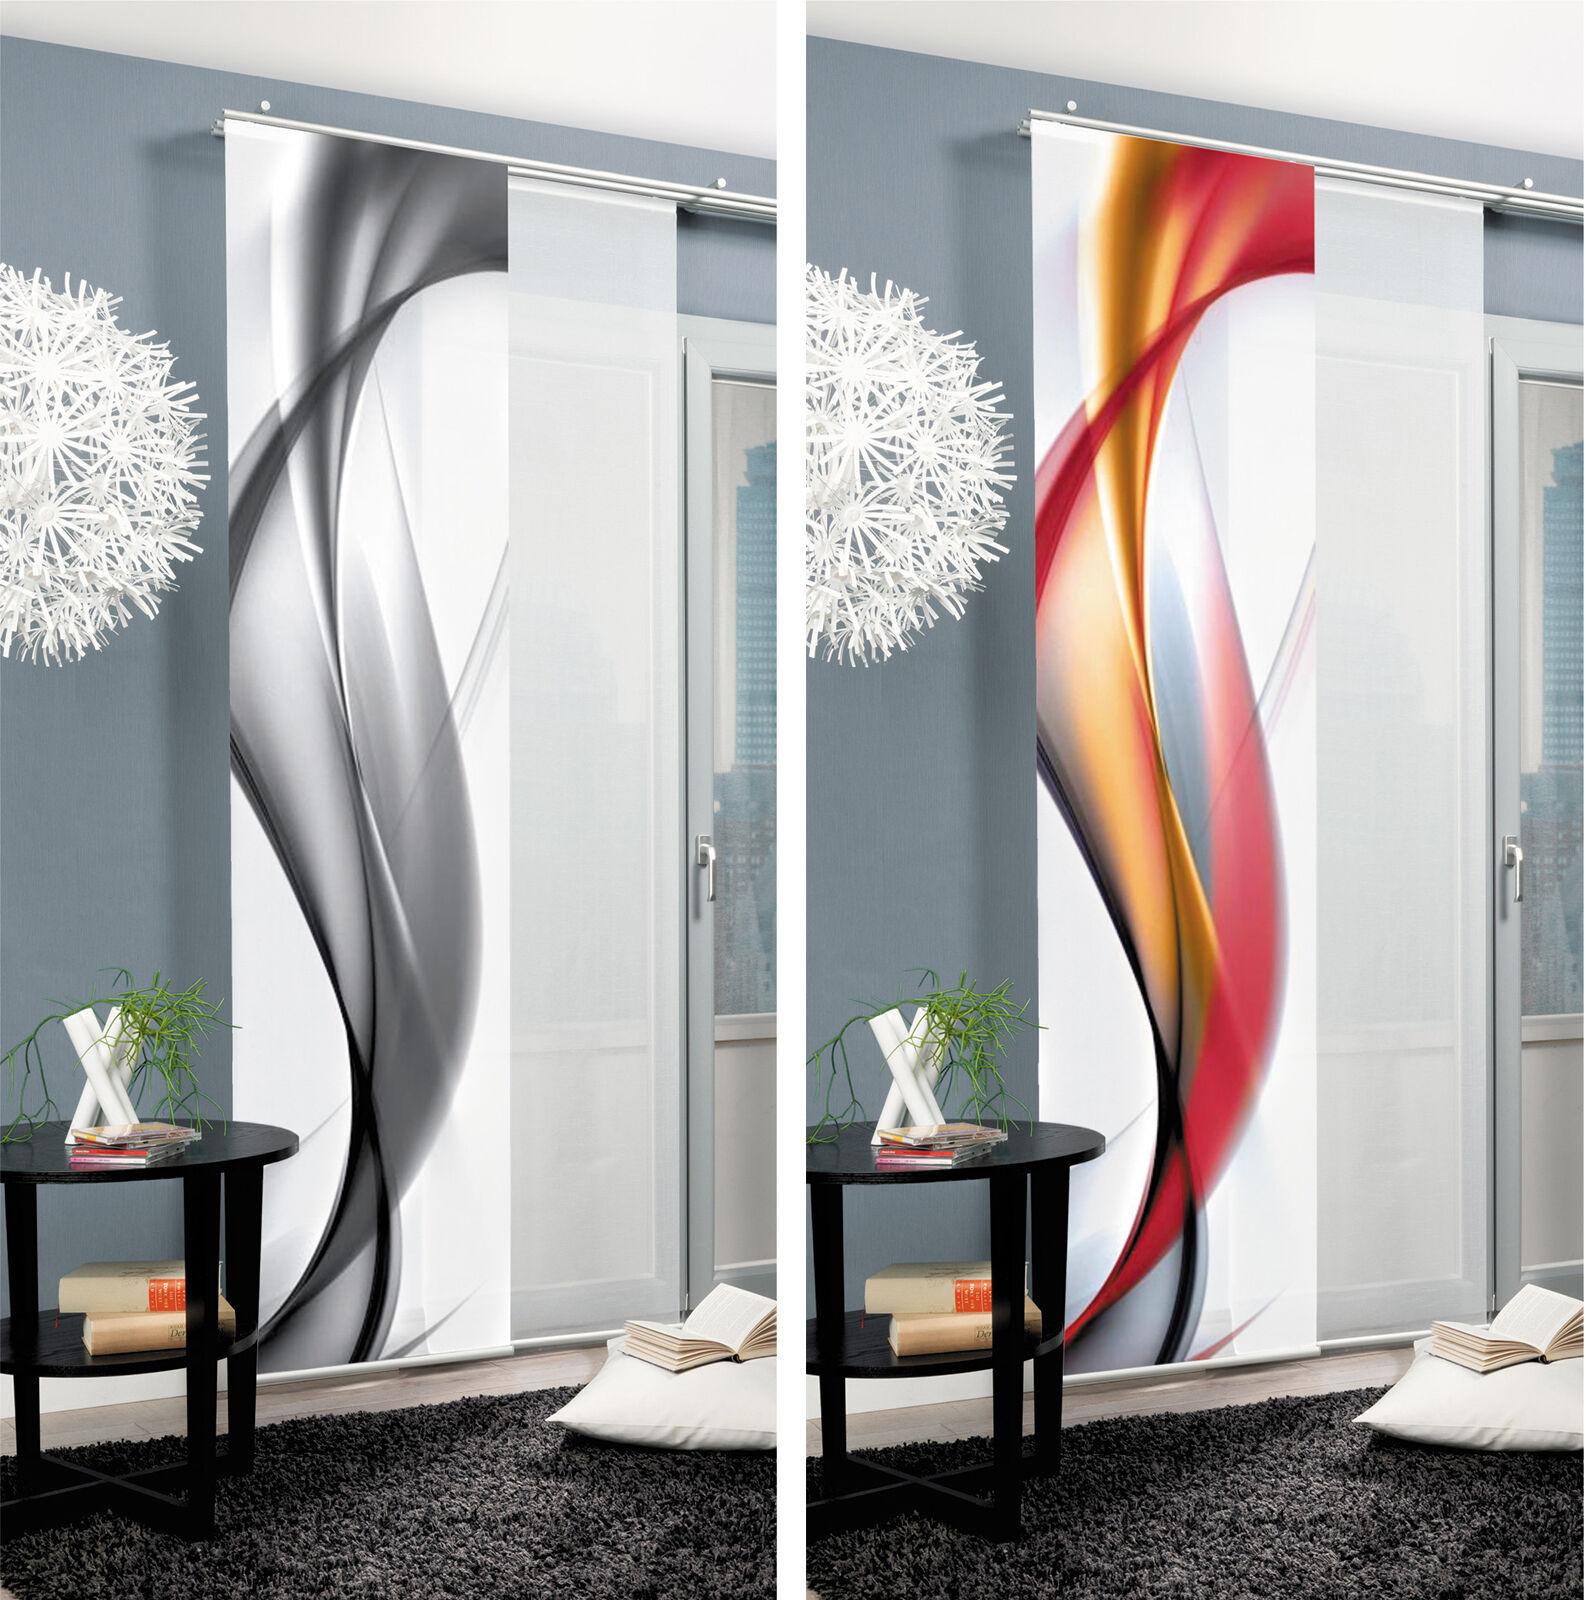 redfield welle graphisch schiebegardine raumteiler digital home wohnideen schmid ebay. Black Bedroom Furniture Sets. Home Design Ideas